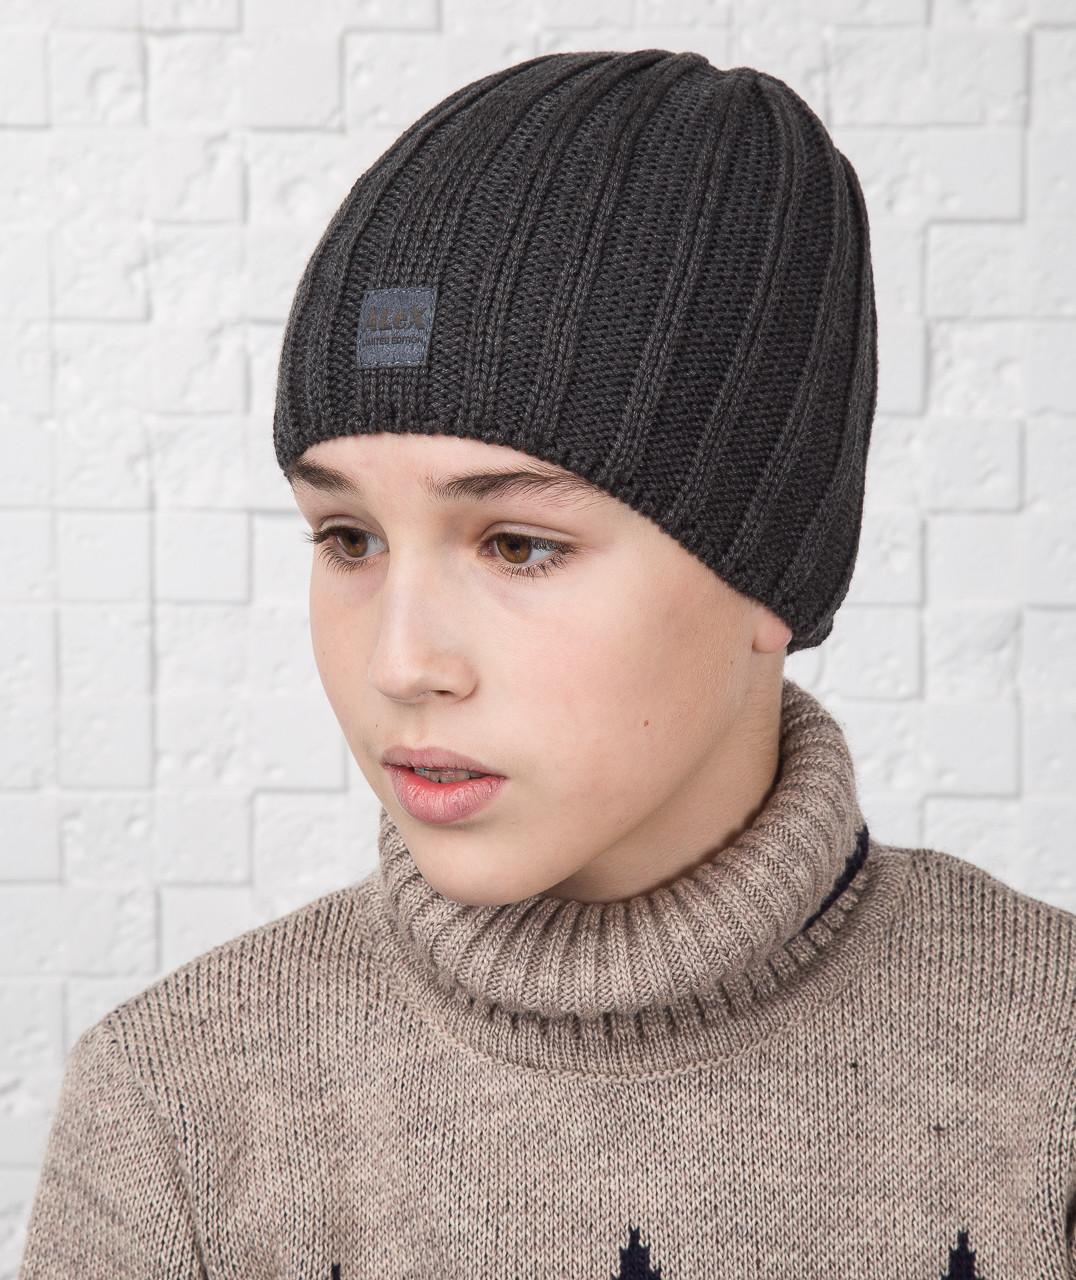 Зимняя шапка для мальчика подростка на флисе - Артикул AL17042